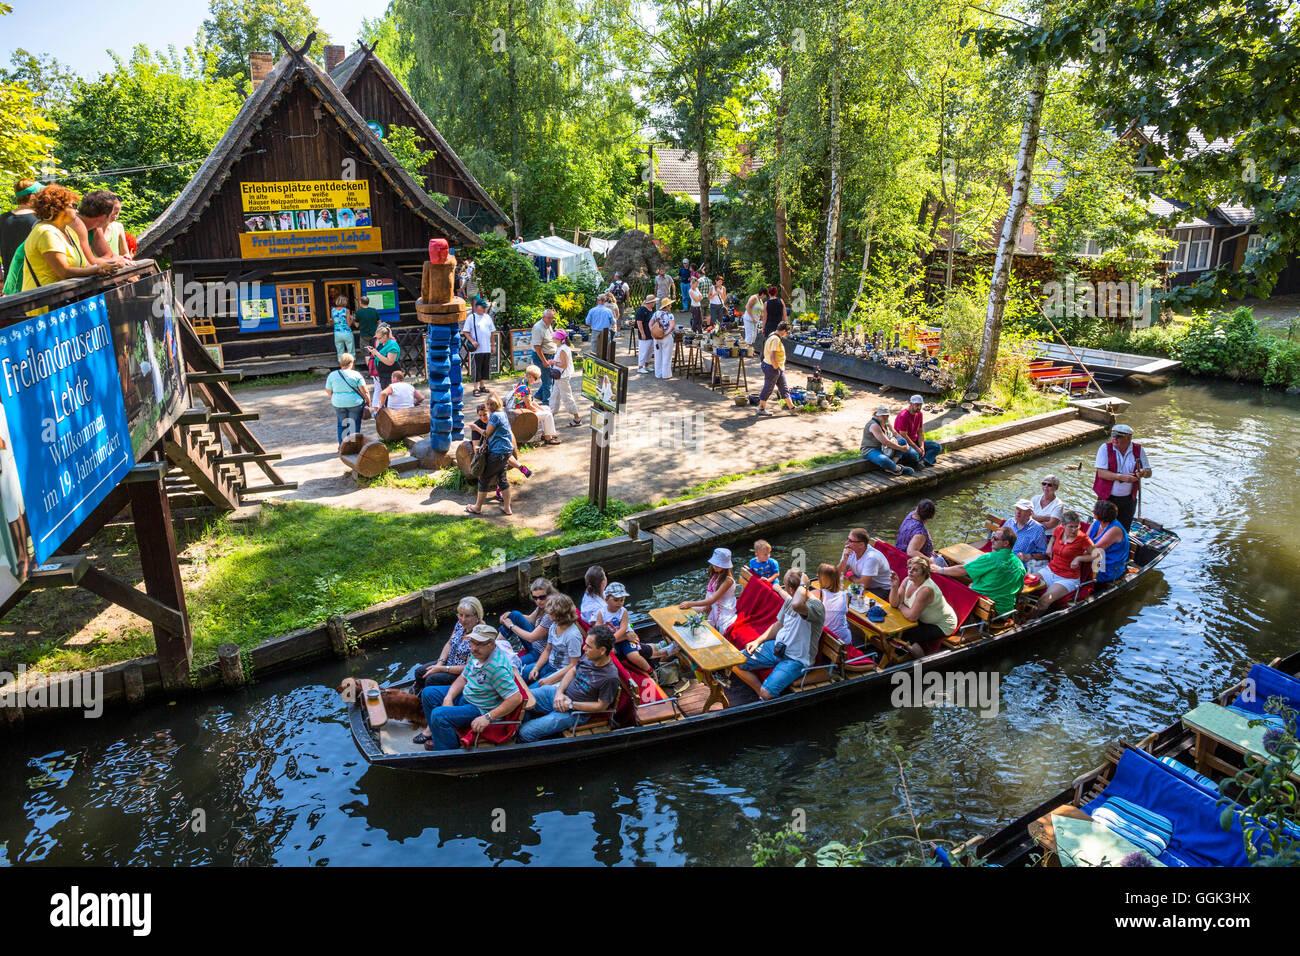 Open Air Museum Lehde, boat tour in Spreewald, UNESCO biosphere reserve, Luebbenau, Brandenburg, Germany, Europe Stock Photo